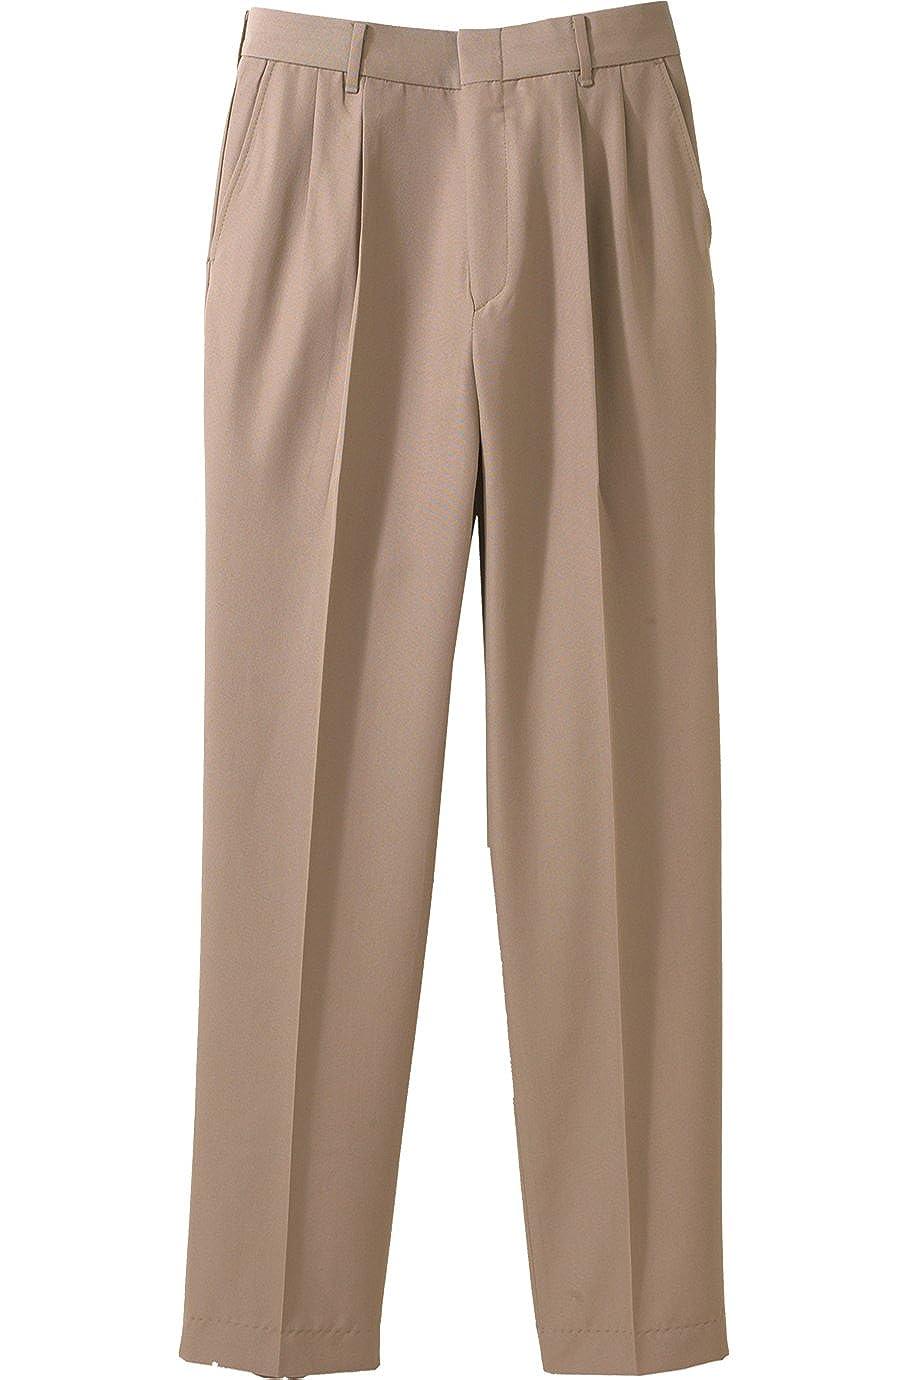 Ed Garments MenS 2620 Lightweight Washable Utility Pants Taupe 34-Ul